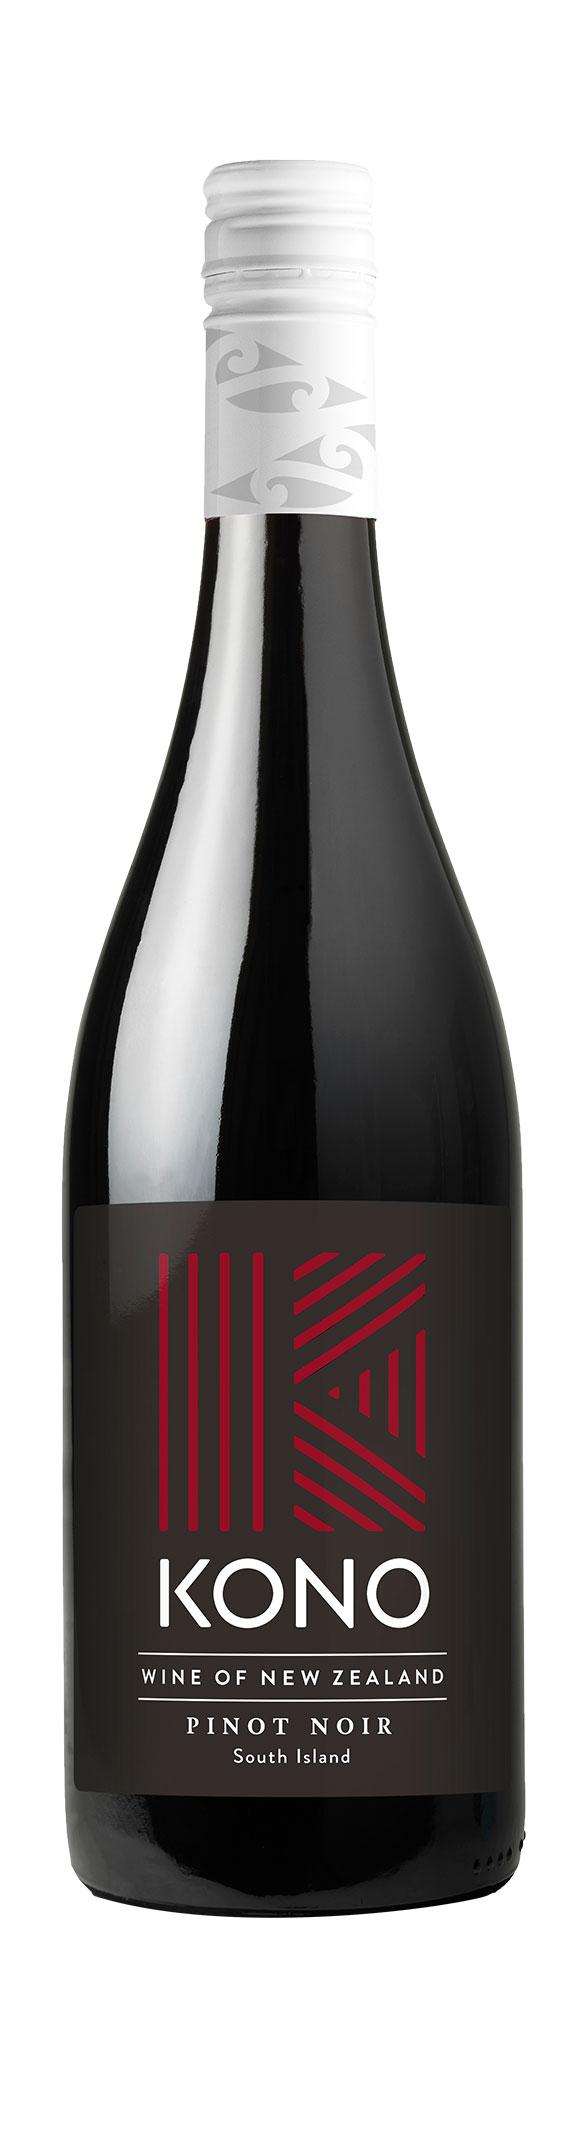 Kono-Wine-Pinot-Noir-White-Cap-NV-ROW-small.jpg